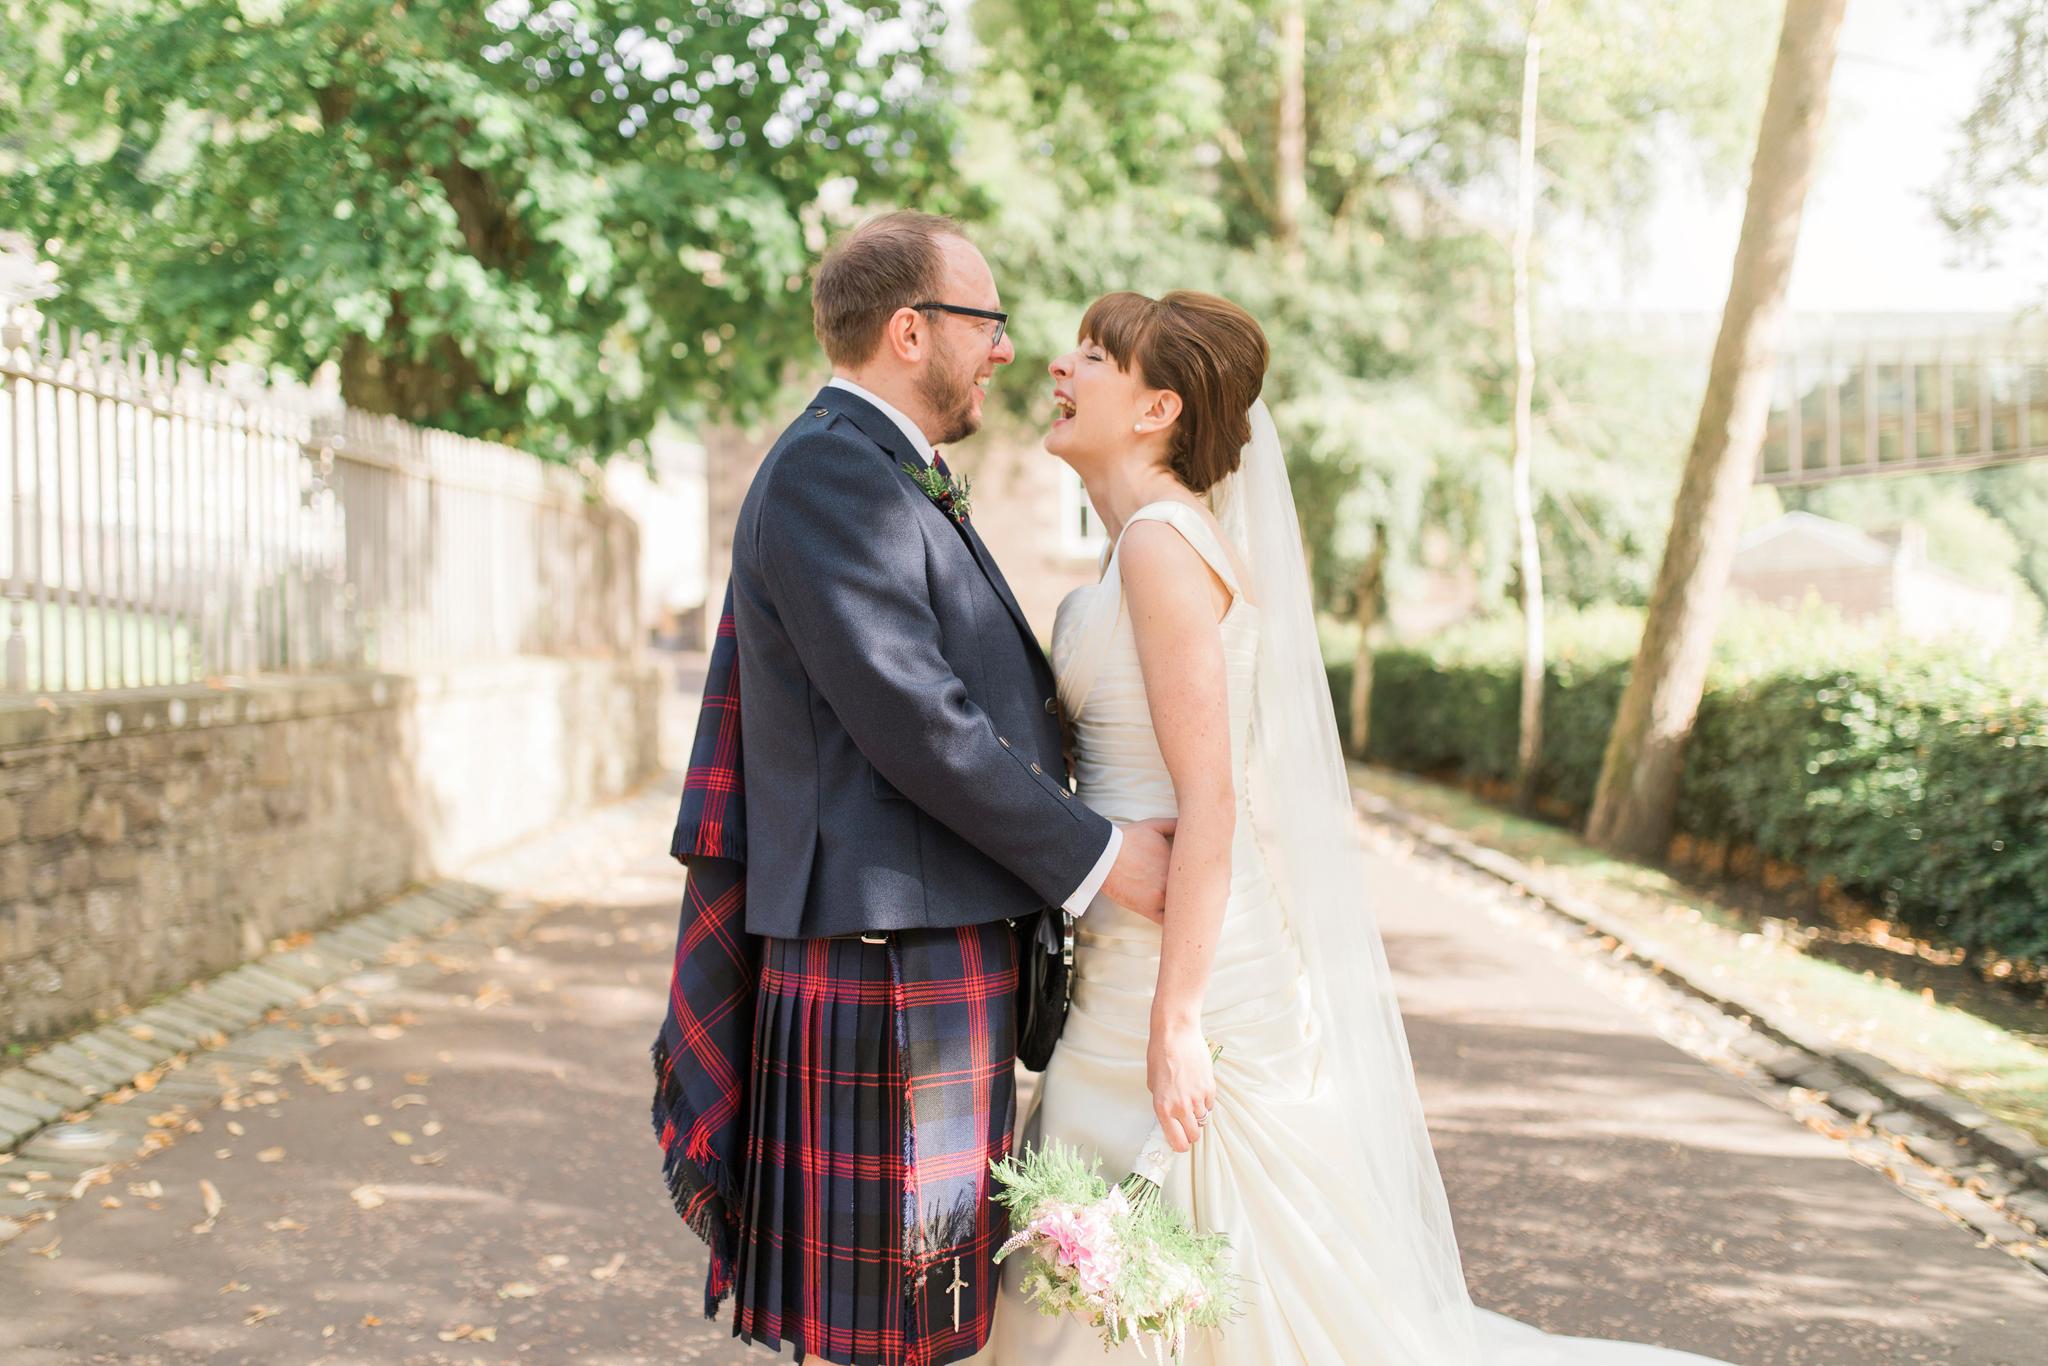 075-scotland-wedding-photographer.jpg